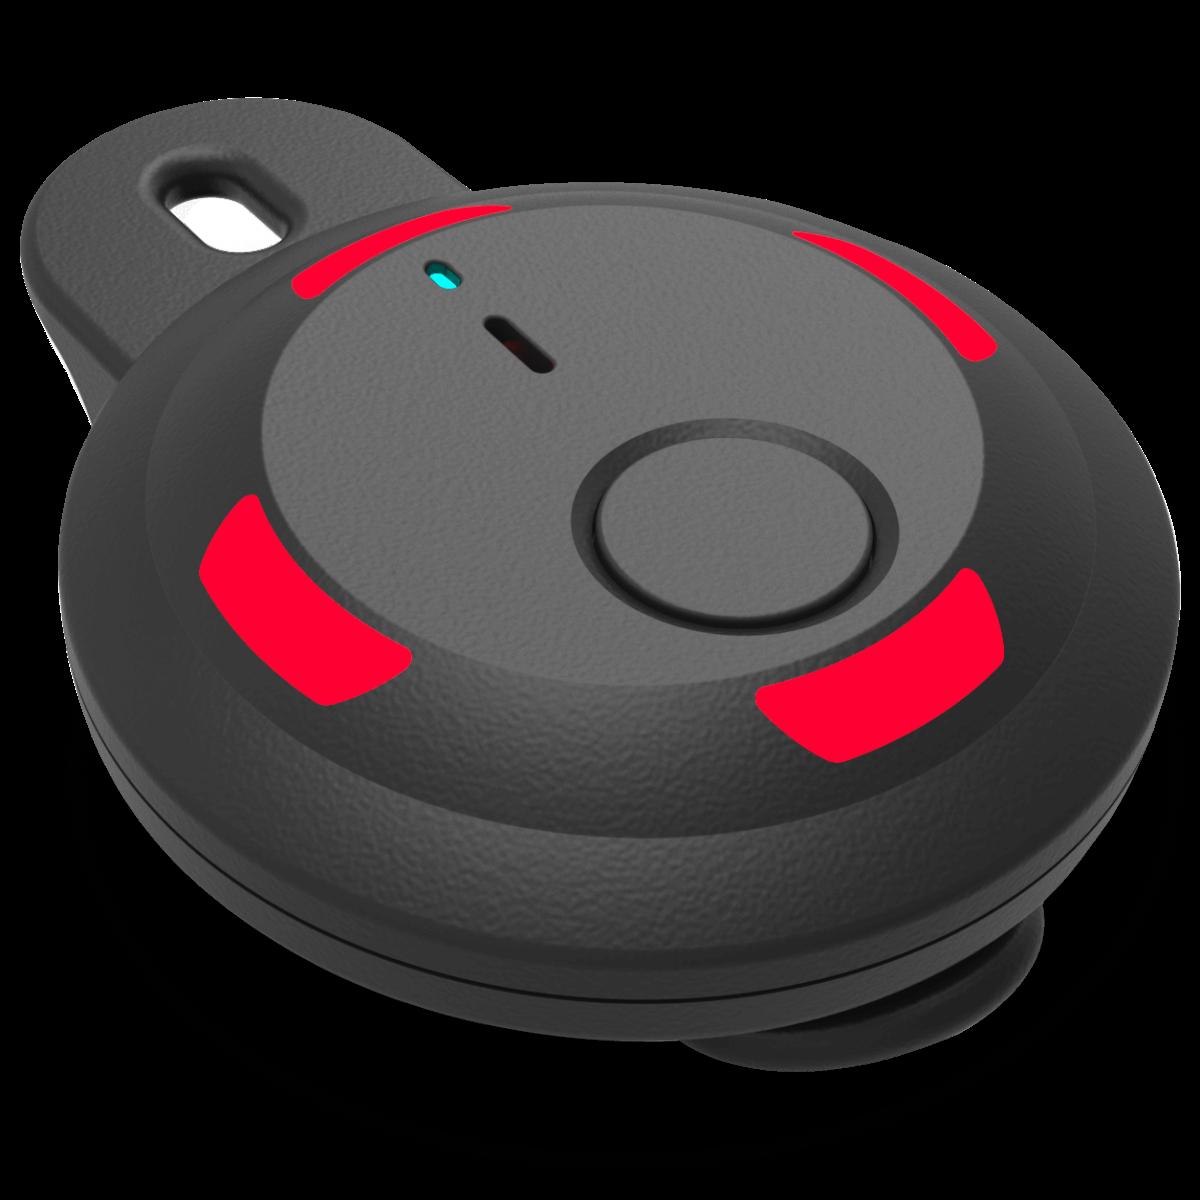 BT710 Tracker and Sensor